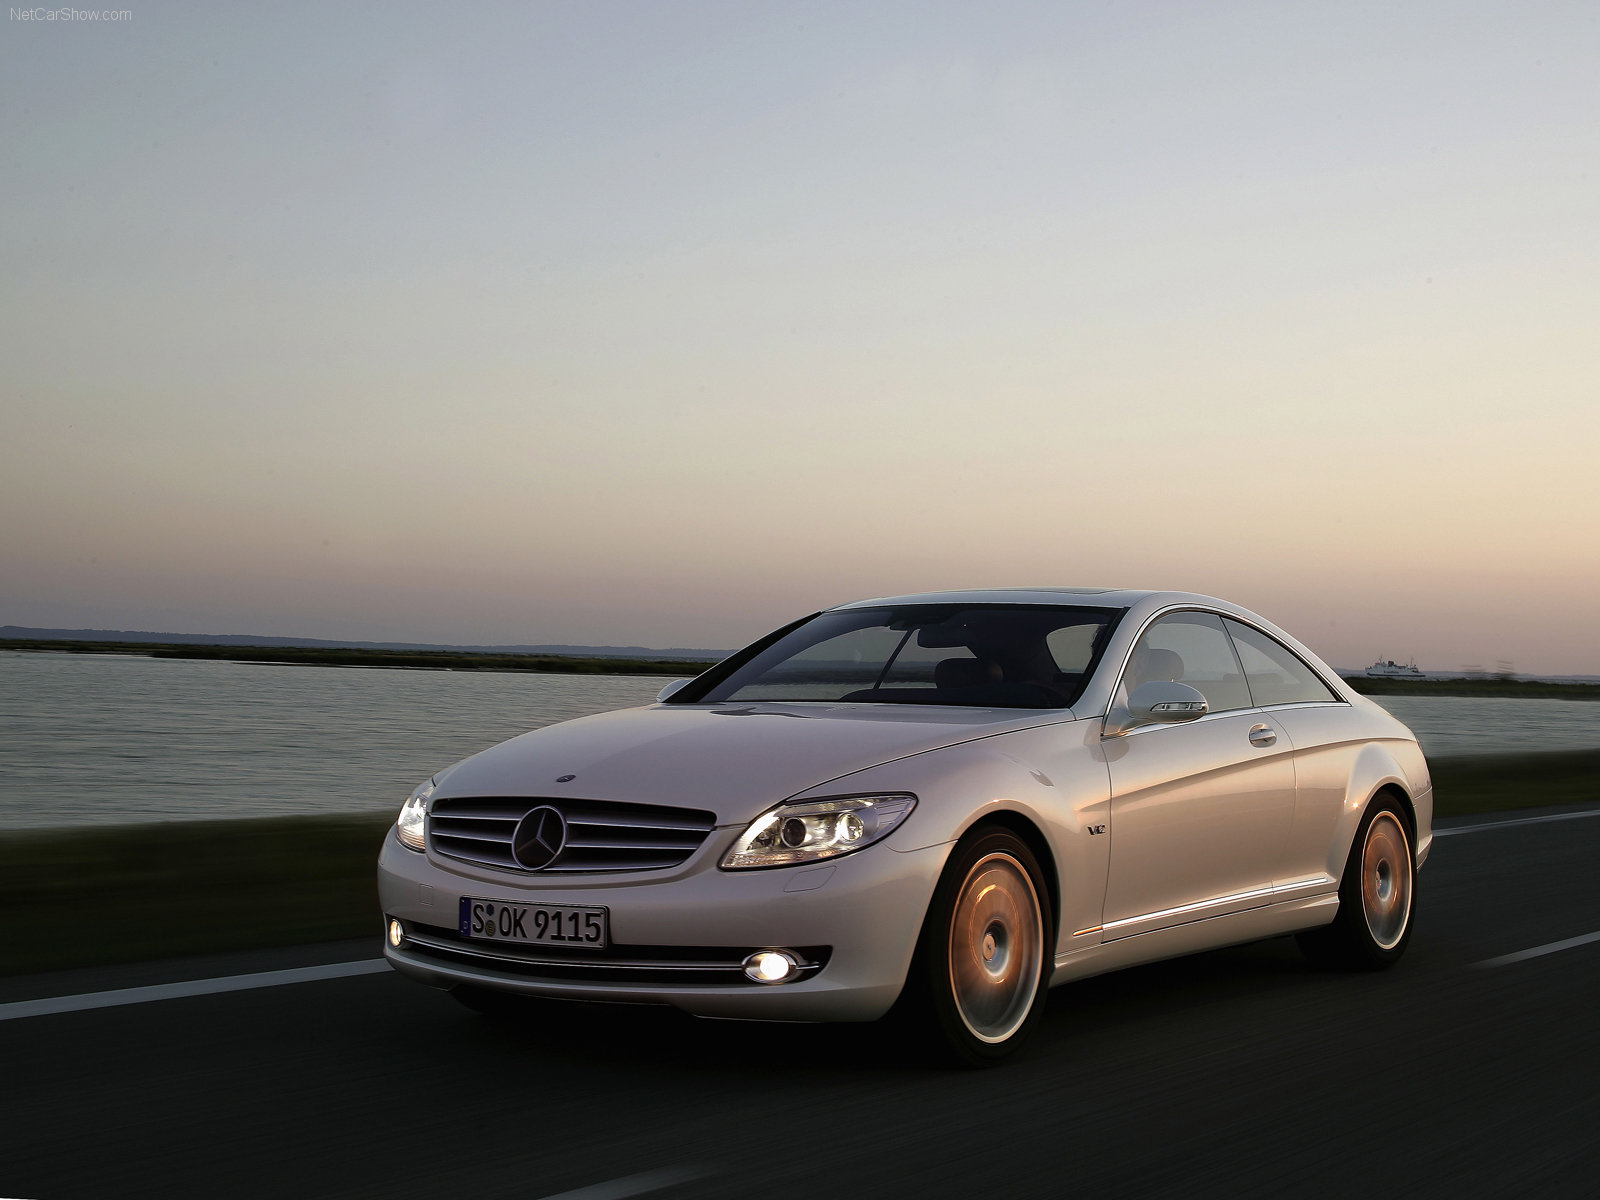 Mercedes benz cl class w216 picture 38166 mercedes for Mercedes benz cl class